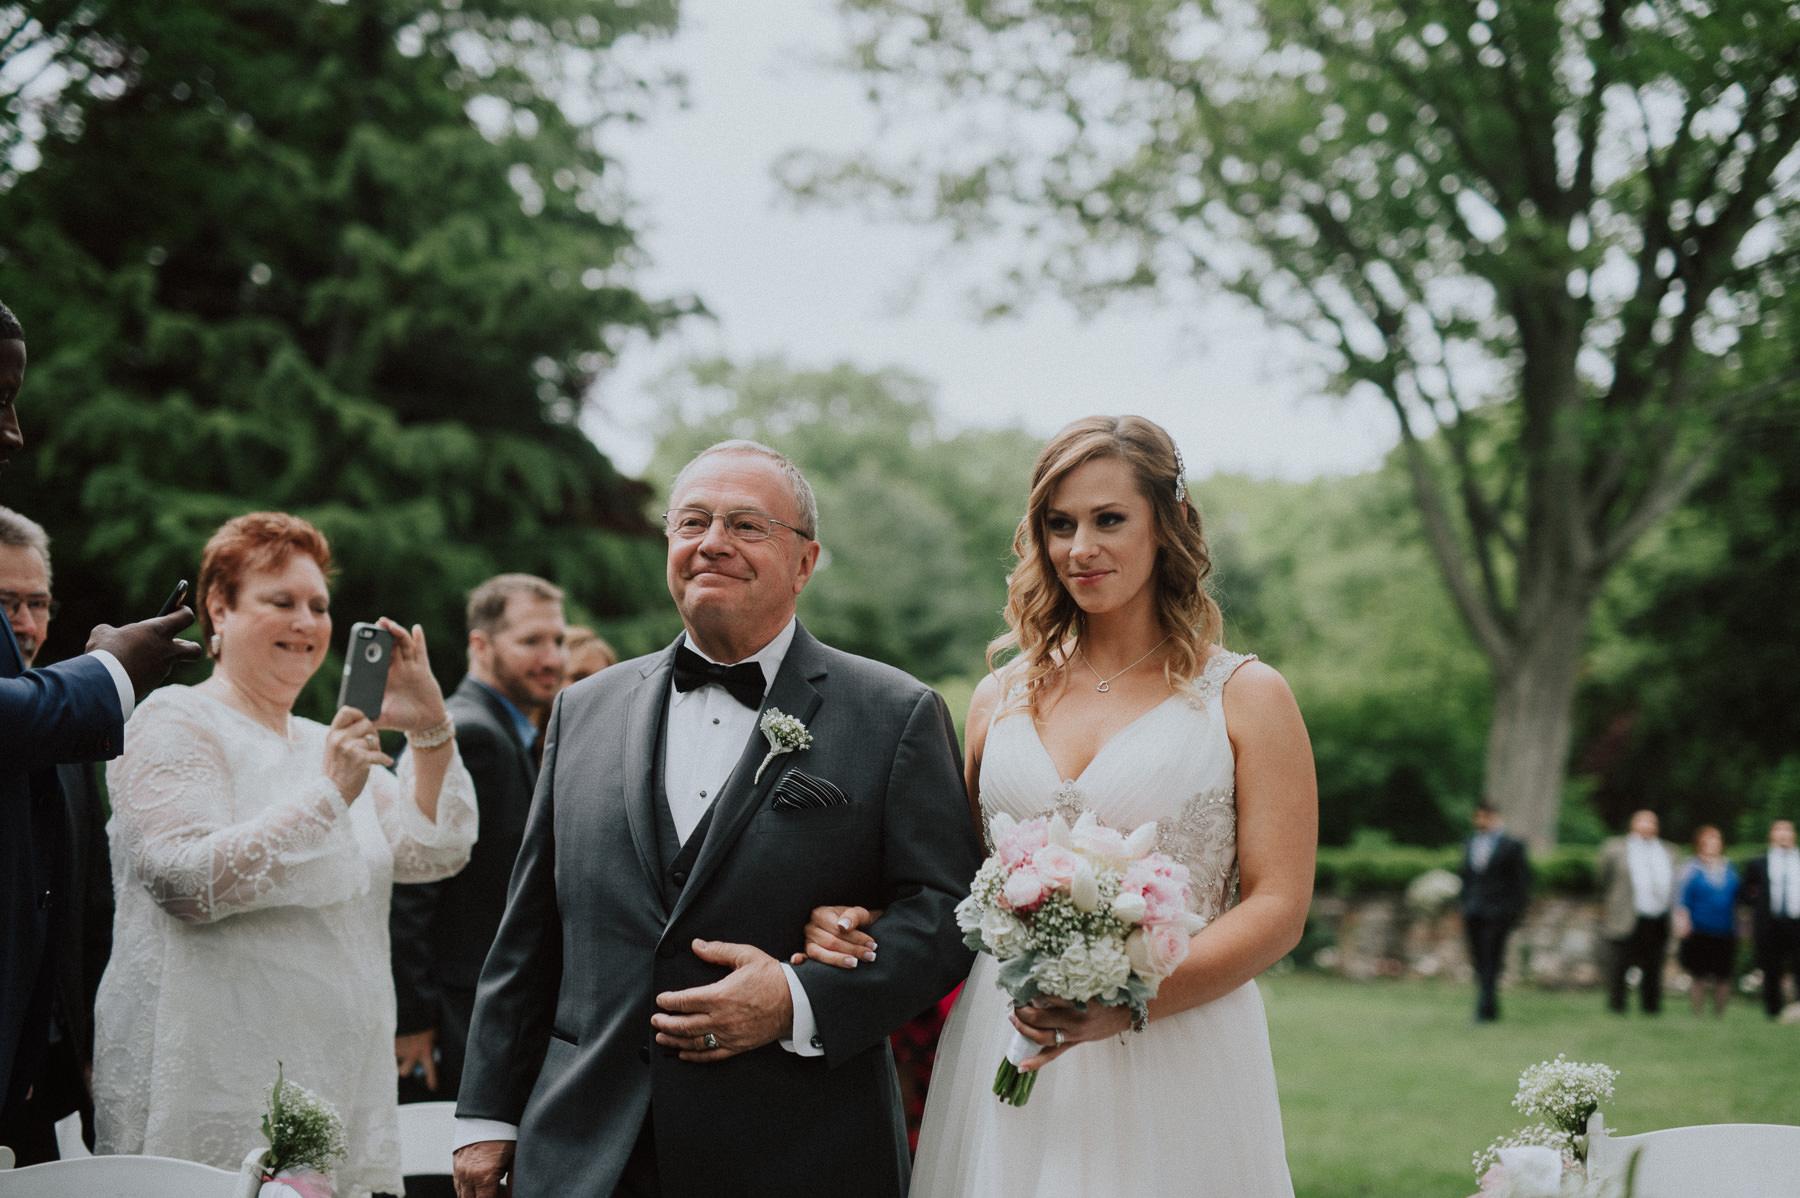 appleford-estate-wedding-photography-55.jpg